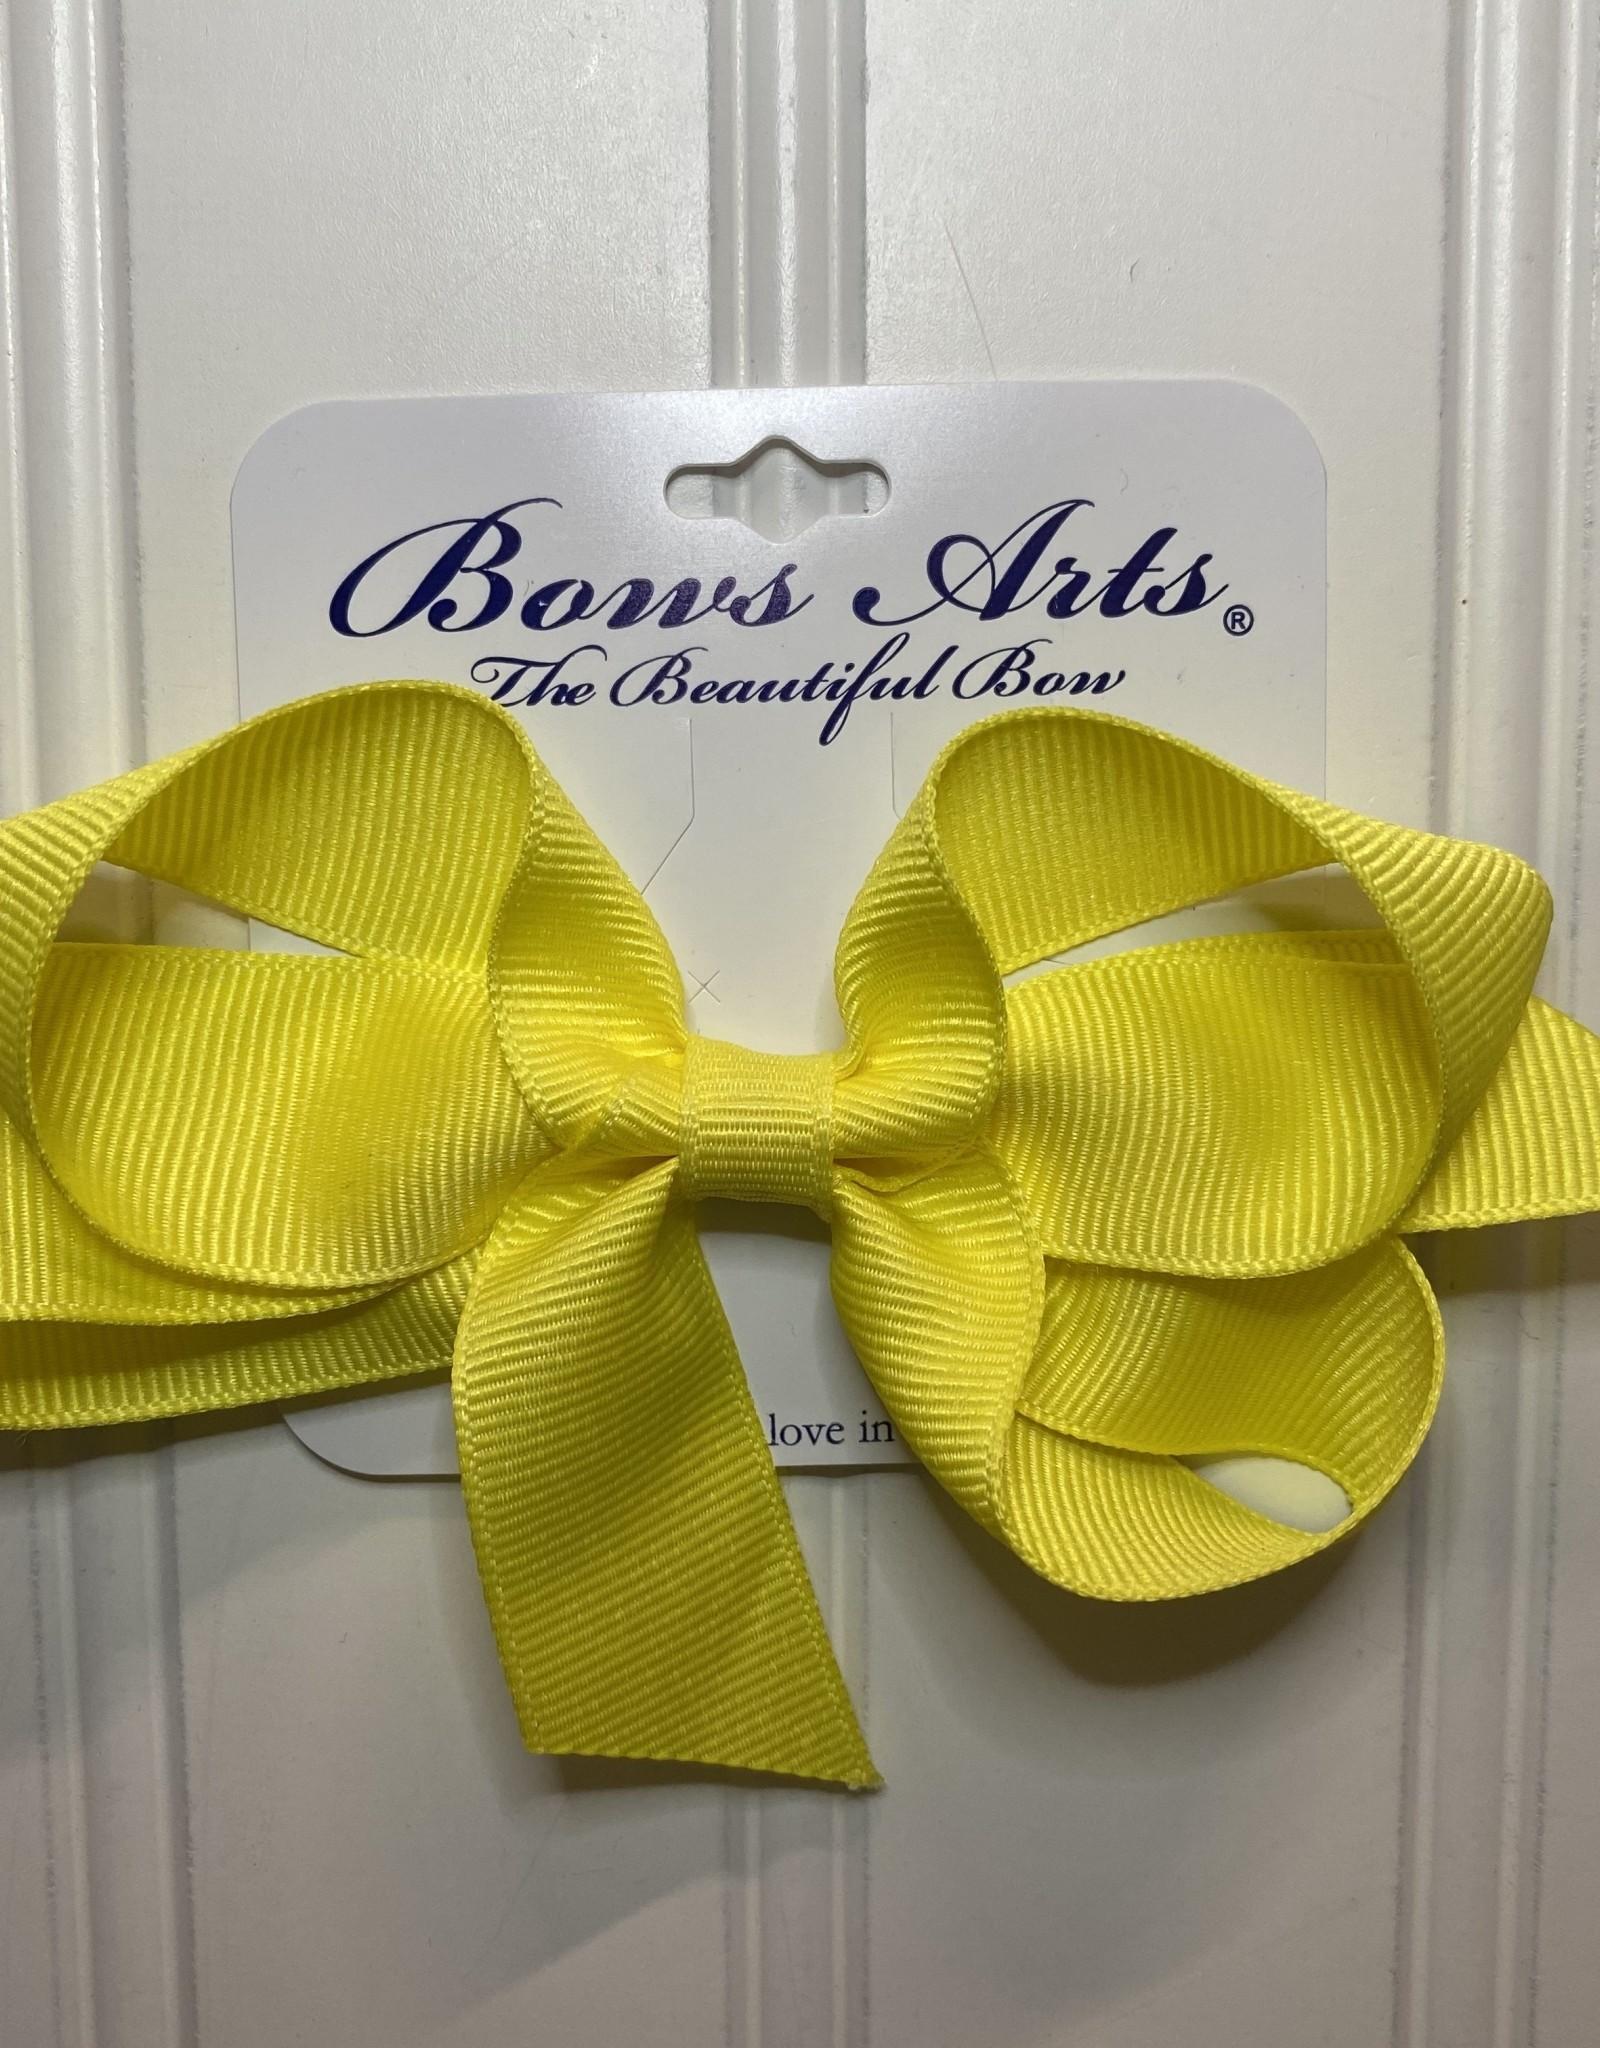 "Bows Arts Small Classic Bow 4"" - Lemon"